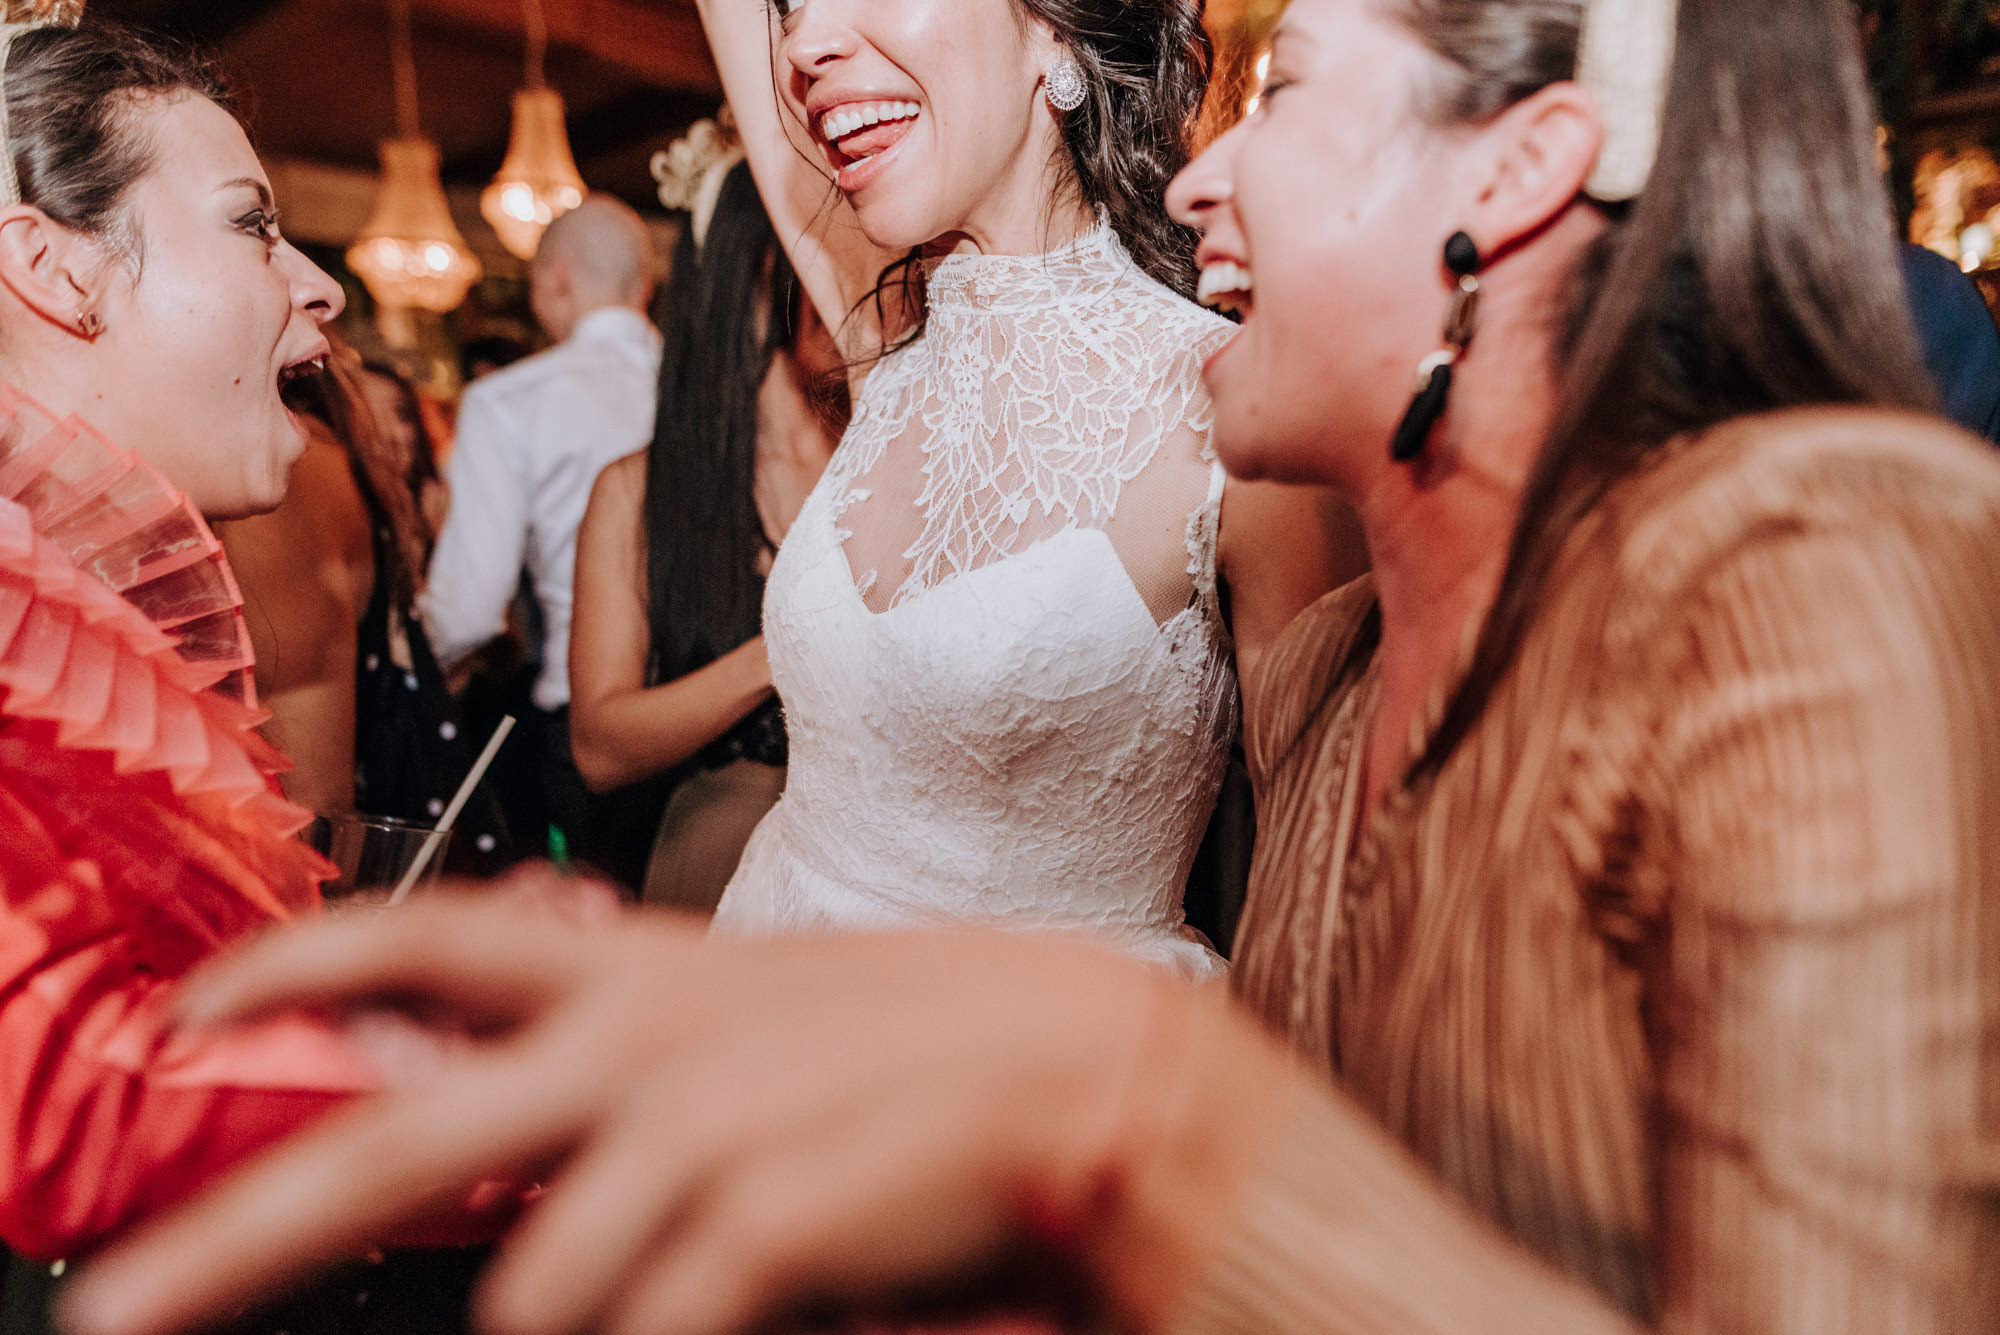 FOTO+PHOTO+BODA+WEDDING+ITALIA+ITALY+MAURICIO+GARAY+MAURICIOGARAY+WEDDINPHOTOGRAPHER+FOTOGRAFODEBODA-2169.jpg